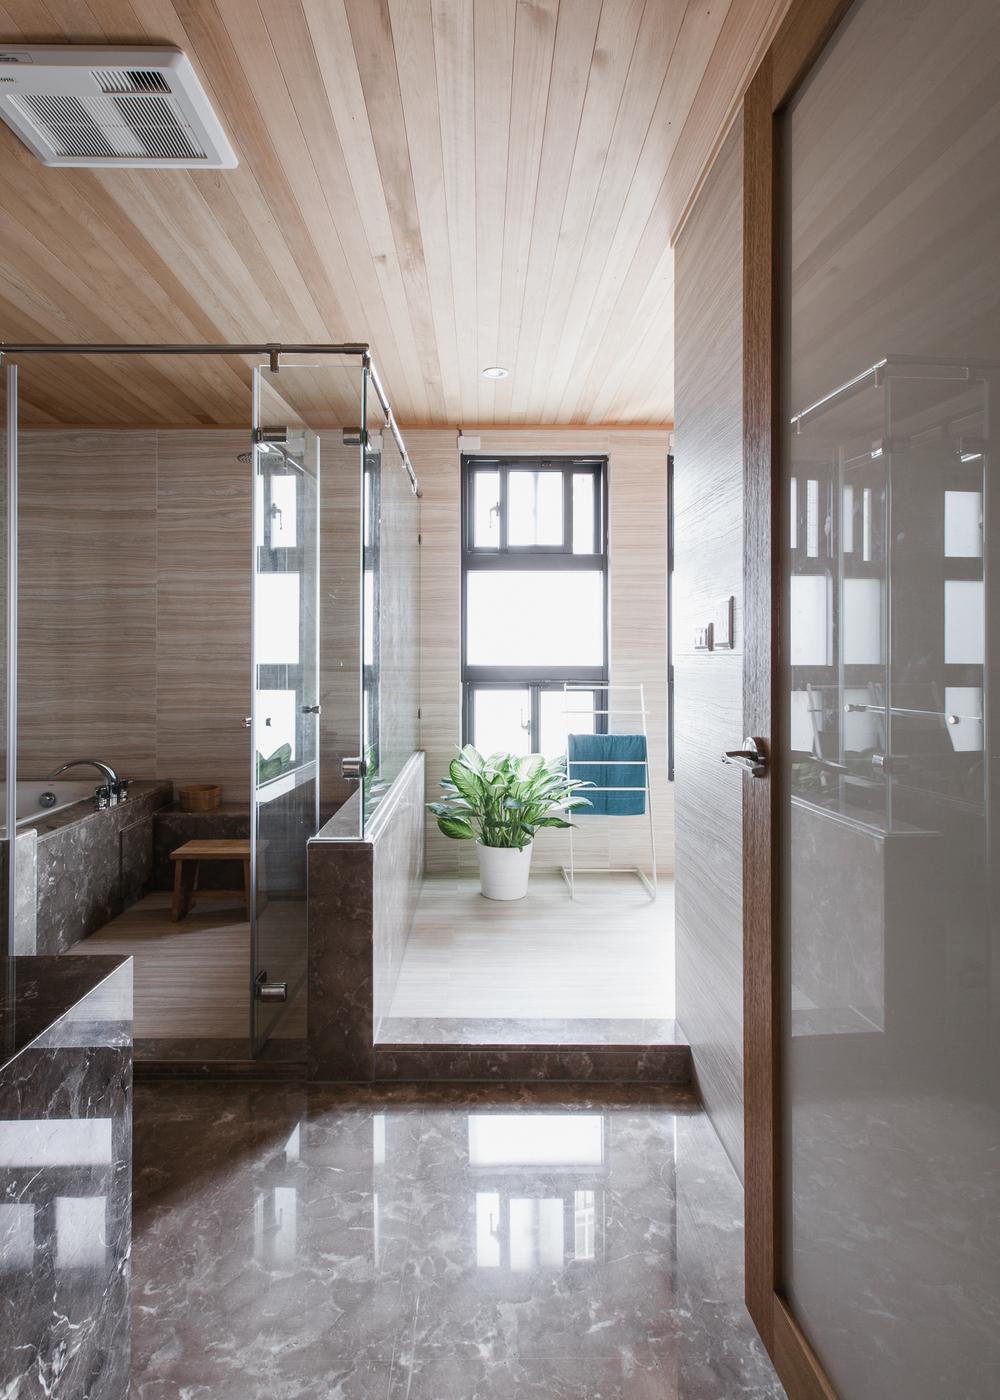 Interiors-58.jpg